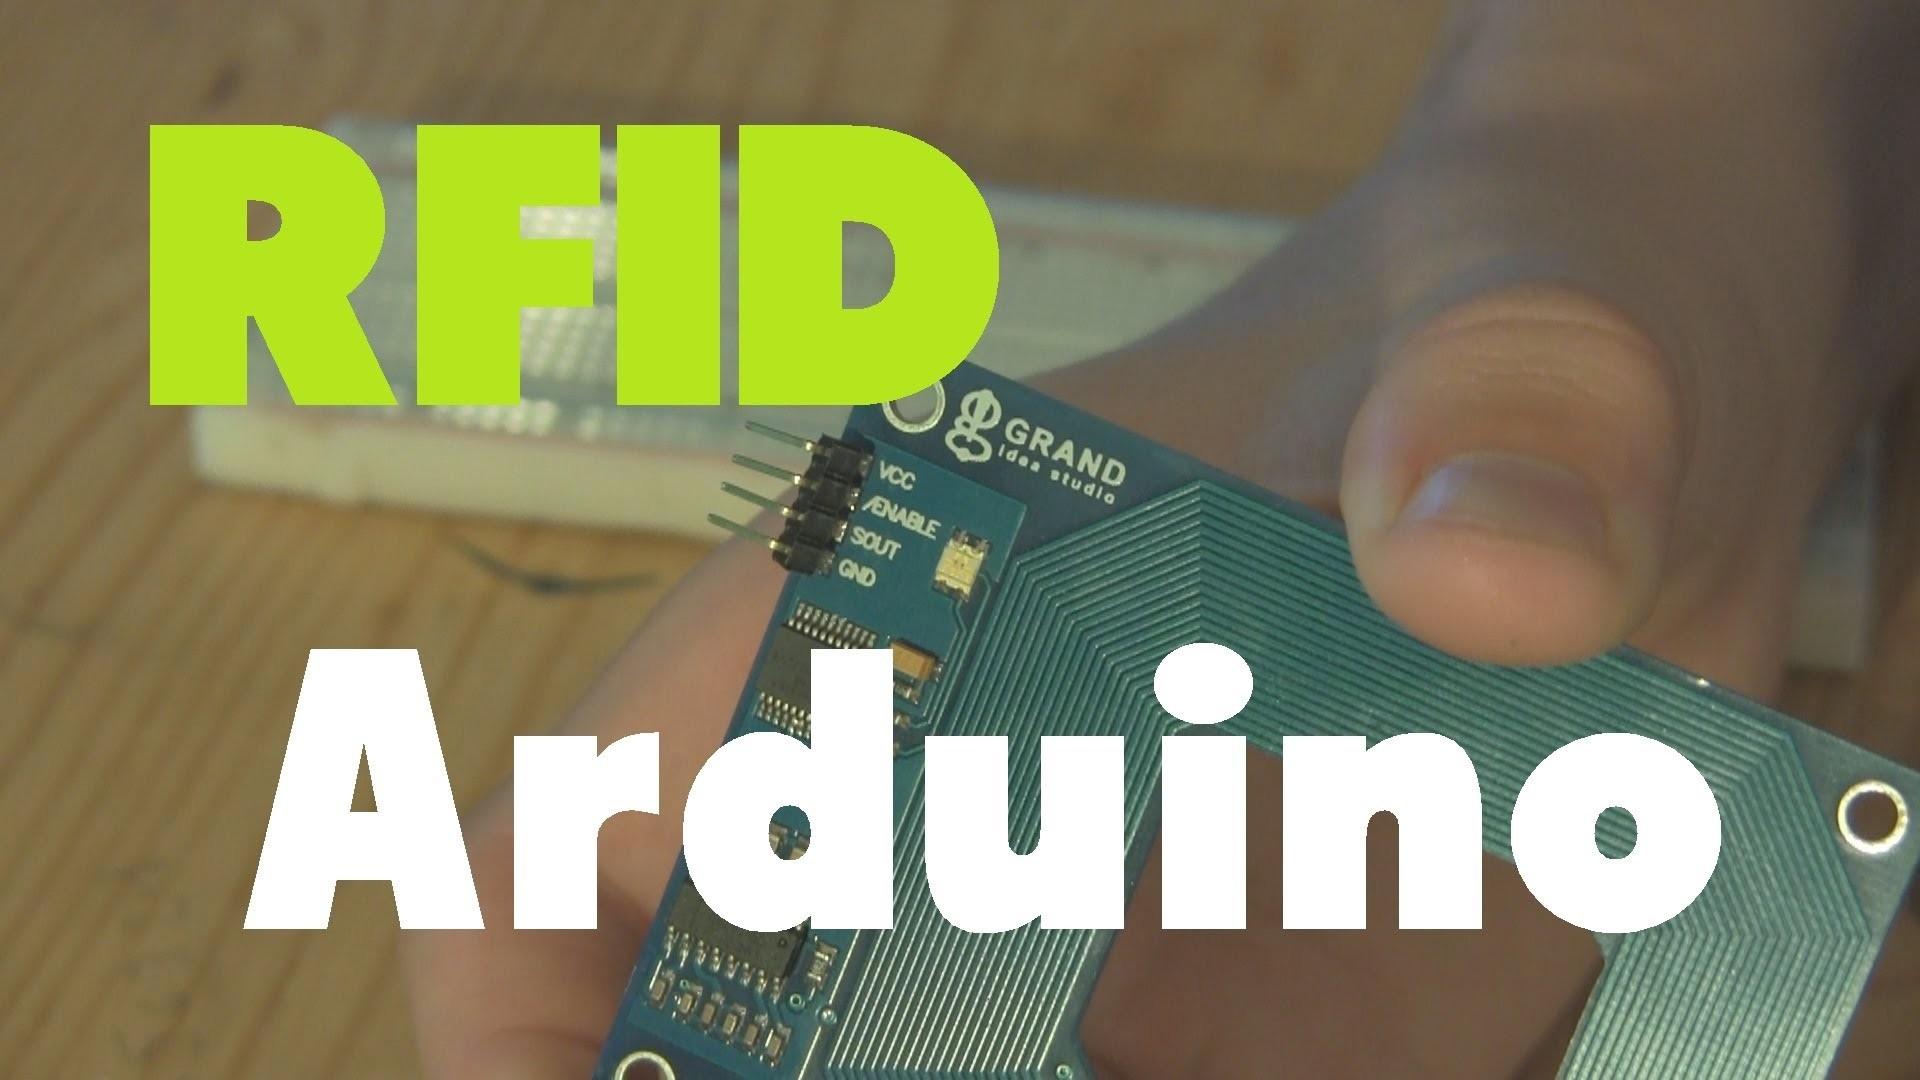 exploring arduino jeremy blum_pdf - docscrewbankscom